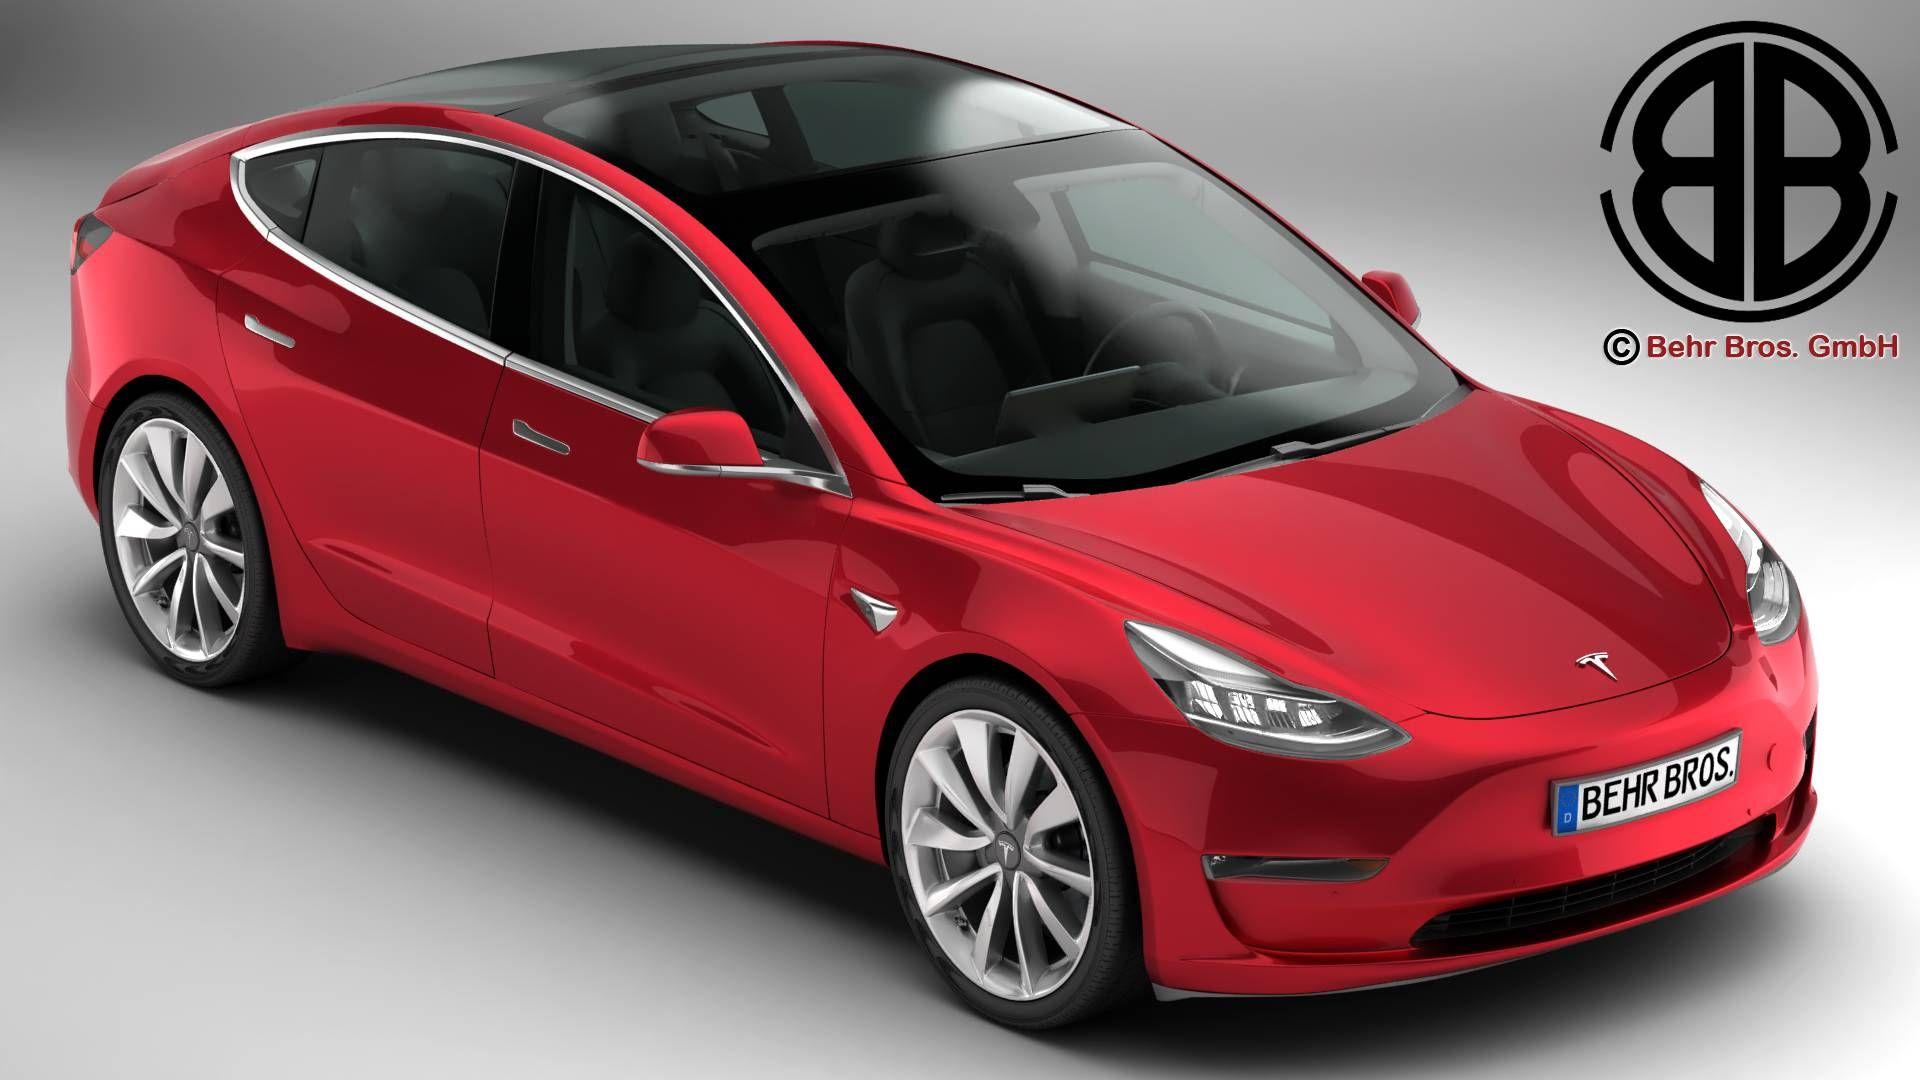 Tesla Model 3 2018 3d Model Flatpyramid Tesla Model Tesla Buy Used Cars